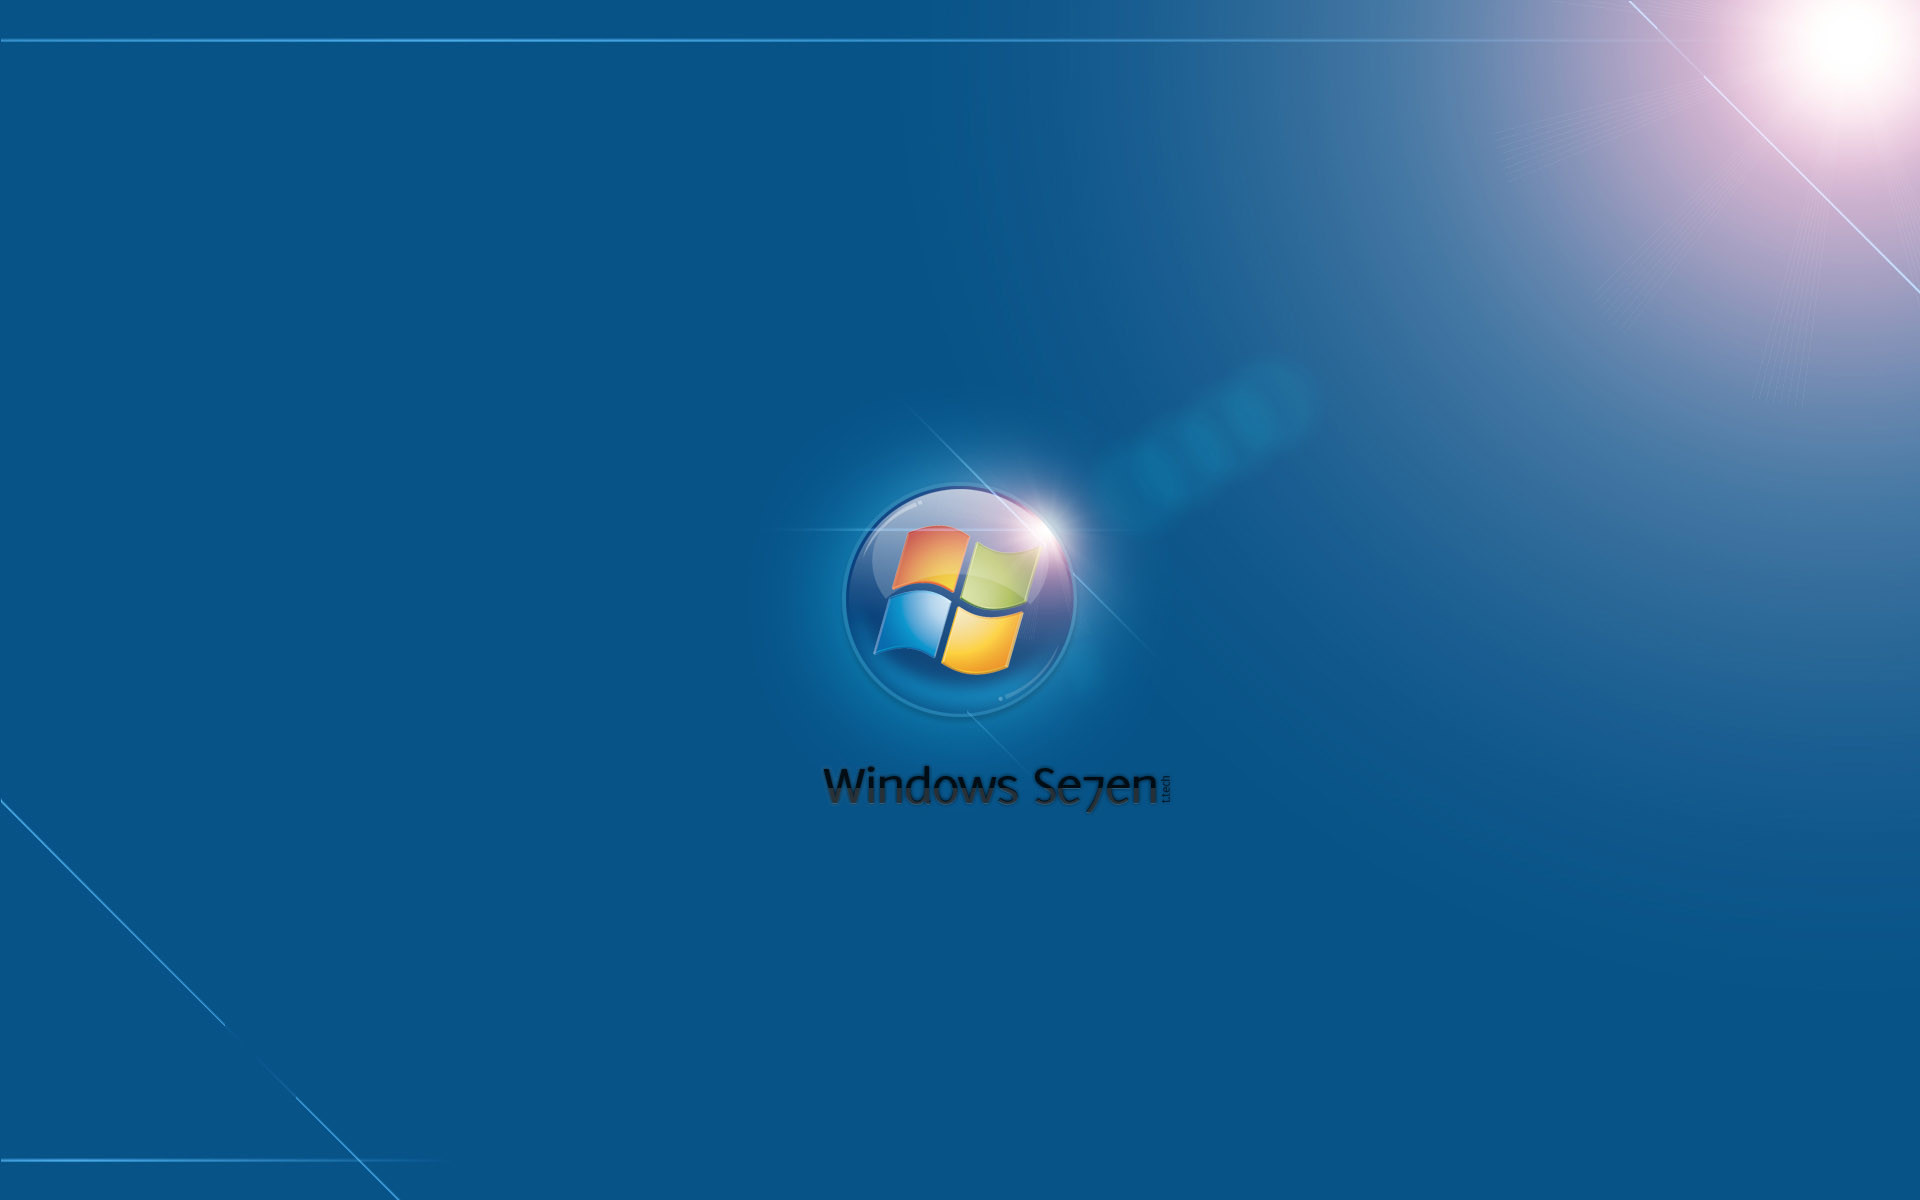 wallpaper: Wallpaper Hd Desktop Windows Desktop Backgrounds For Windows 7  HD Wallpapers)